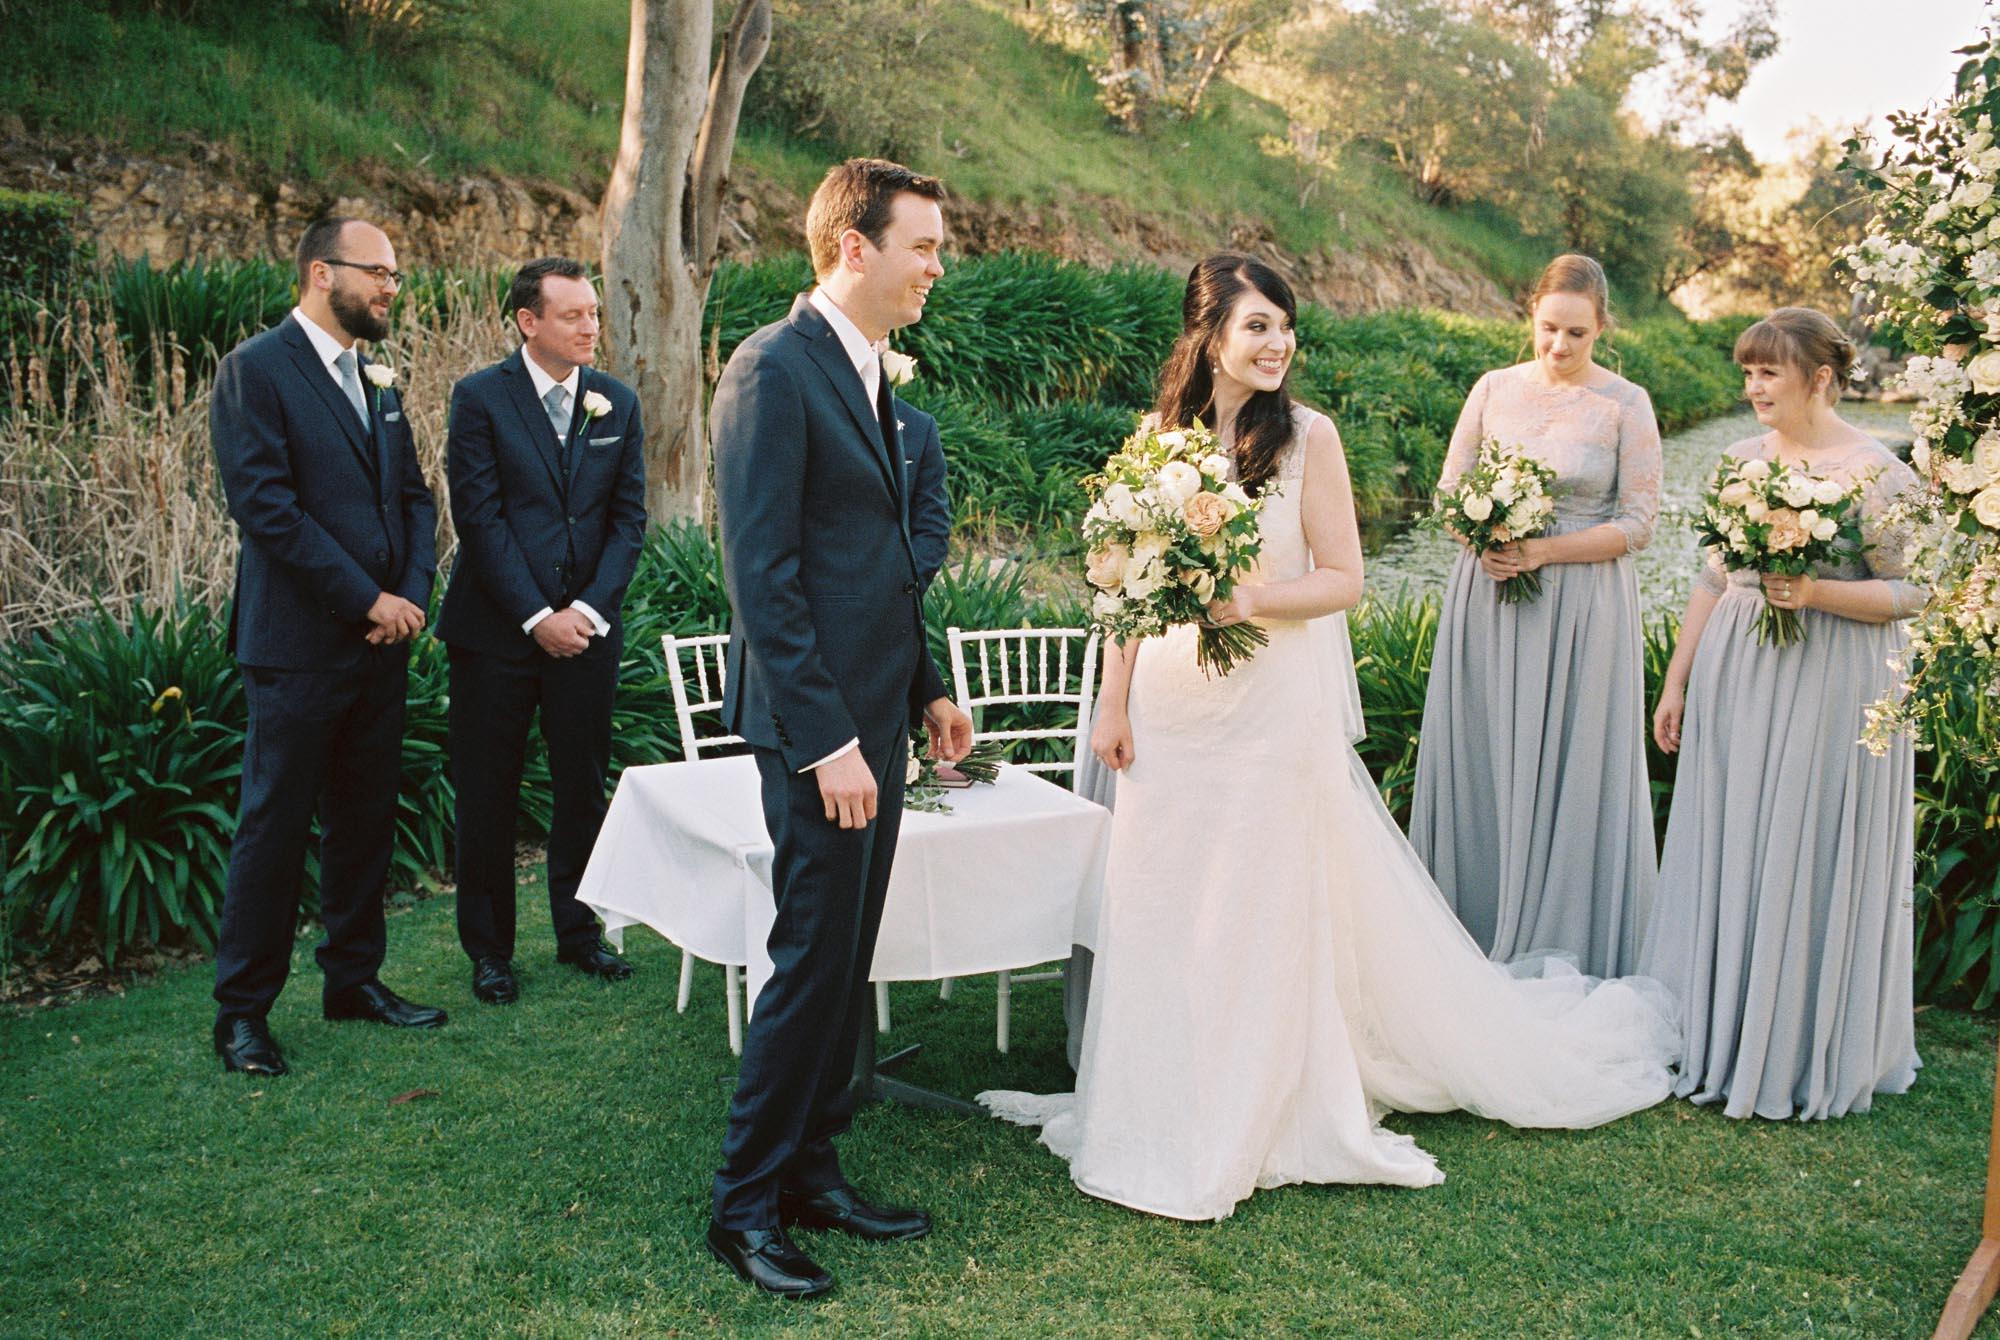 Glen-Ewin-Estate-wedding-photography-047.jpg